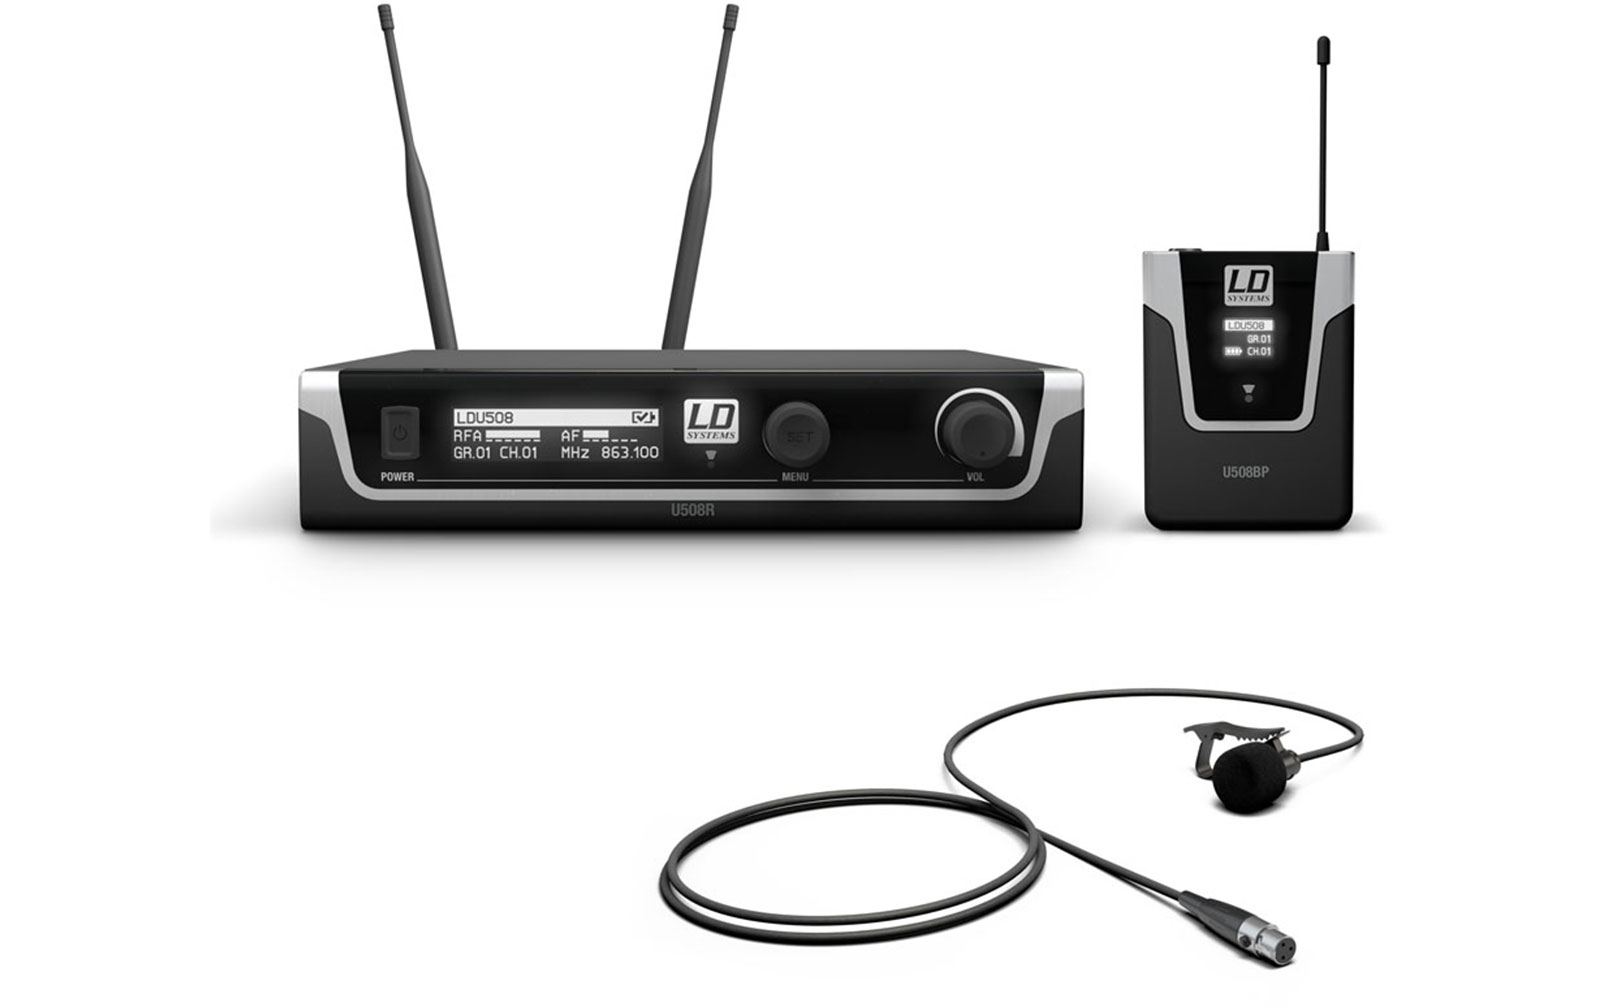 ld-systems-u508-bpl-funkmikrofon-system-mit-bodypack-und-lavalier-mikrofon